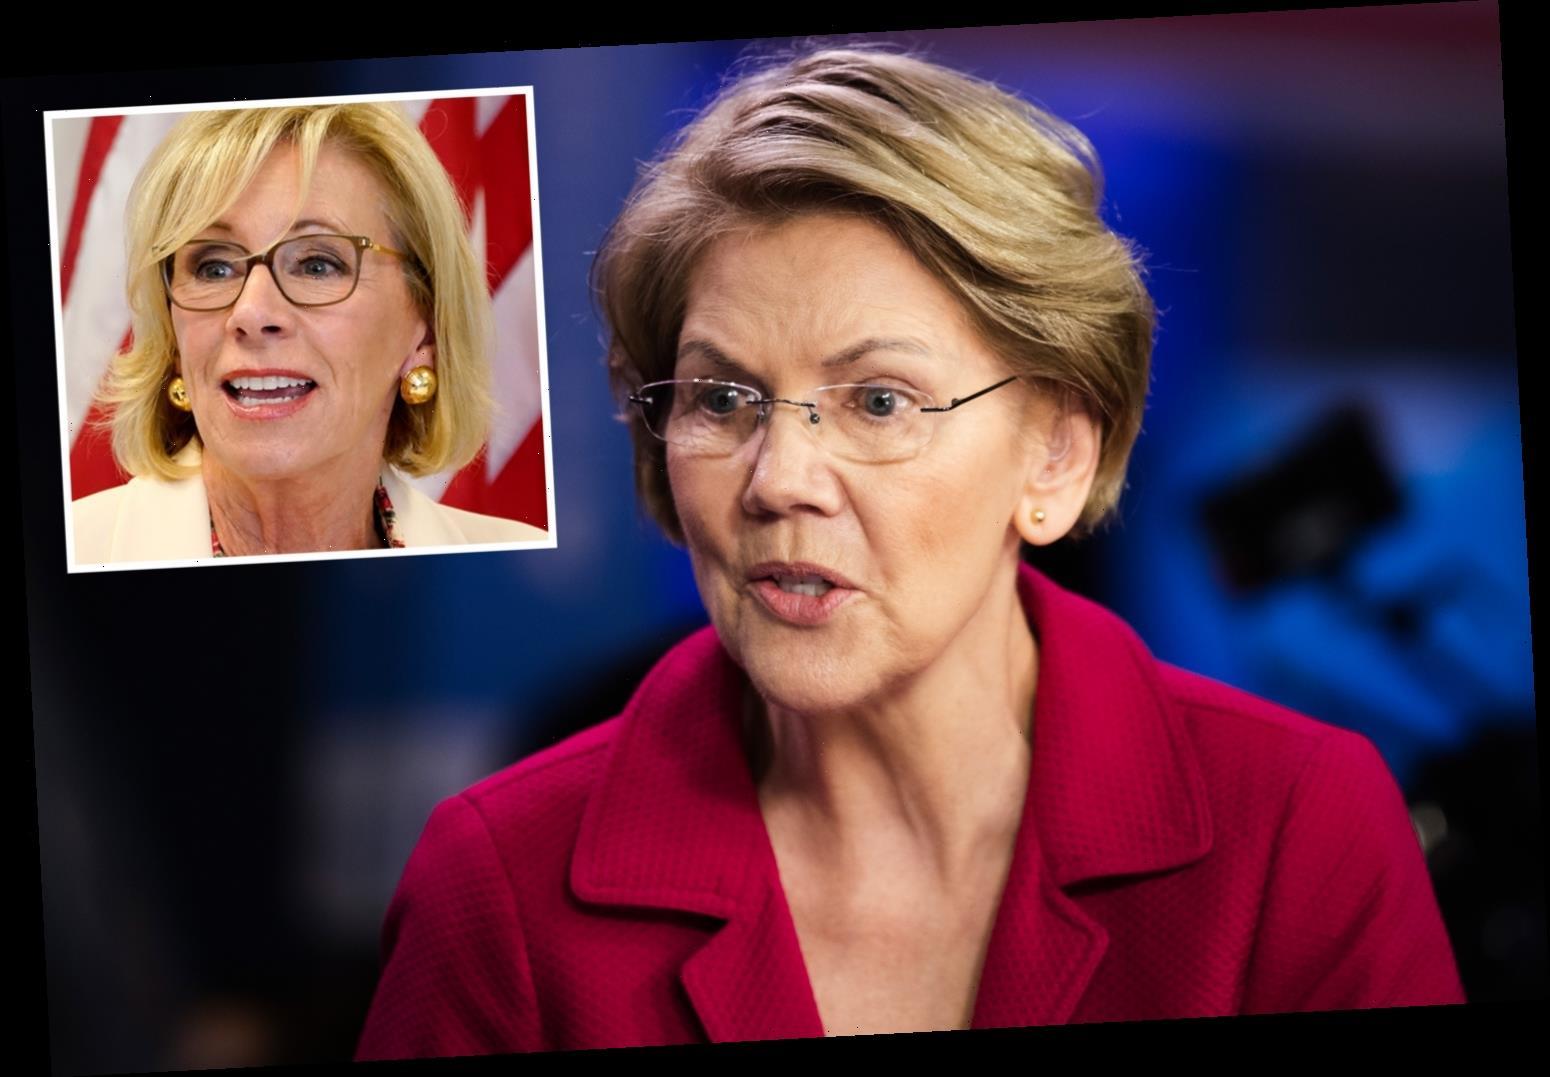 Betsy DeVos was 'worst Secretary of Education ever' says Elizabeth Warren after she quits over violent Capitol riots